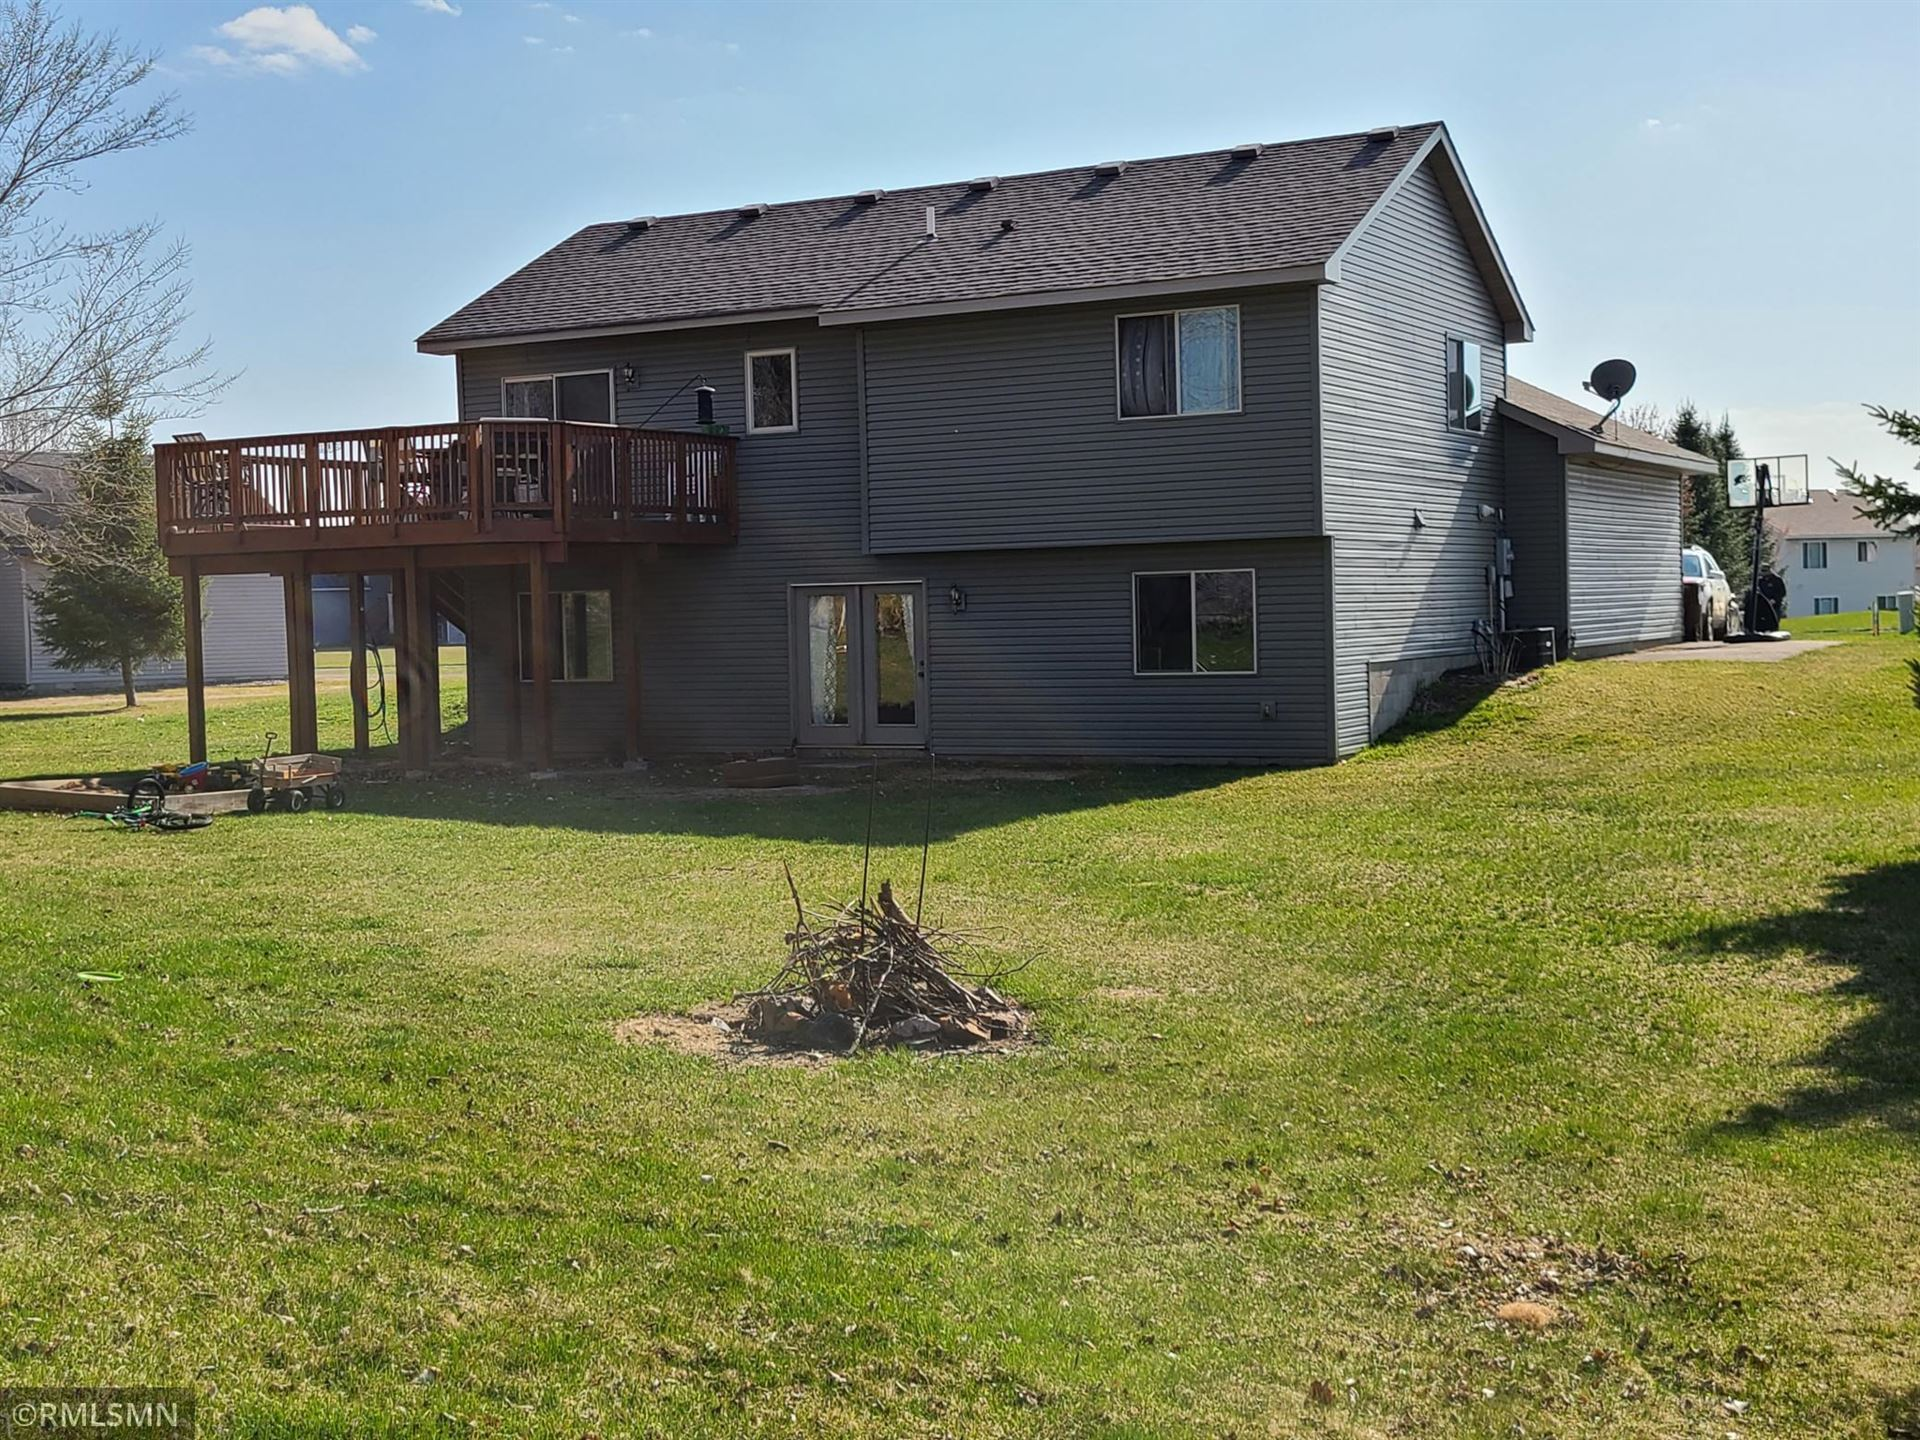 Photo of 1108 Pond View Drive, Braham, MN 55006 (MLS # 5743183)